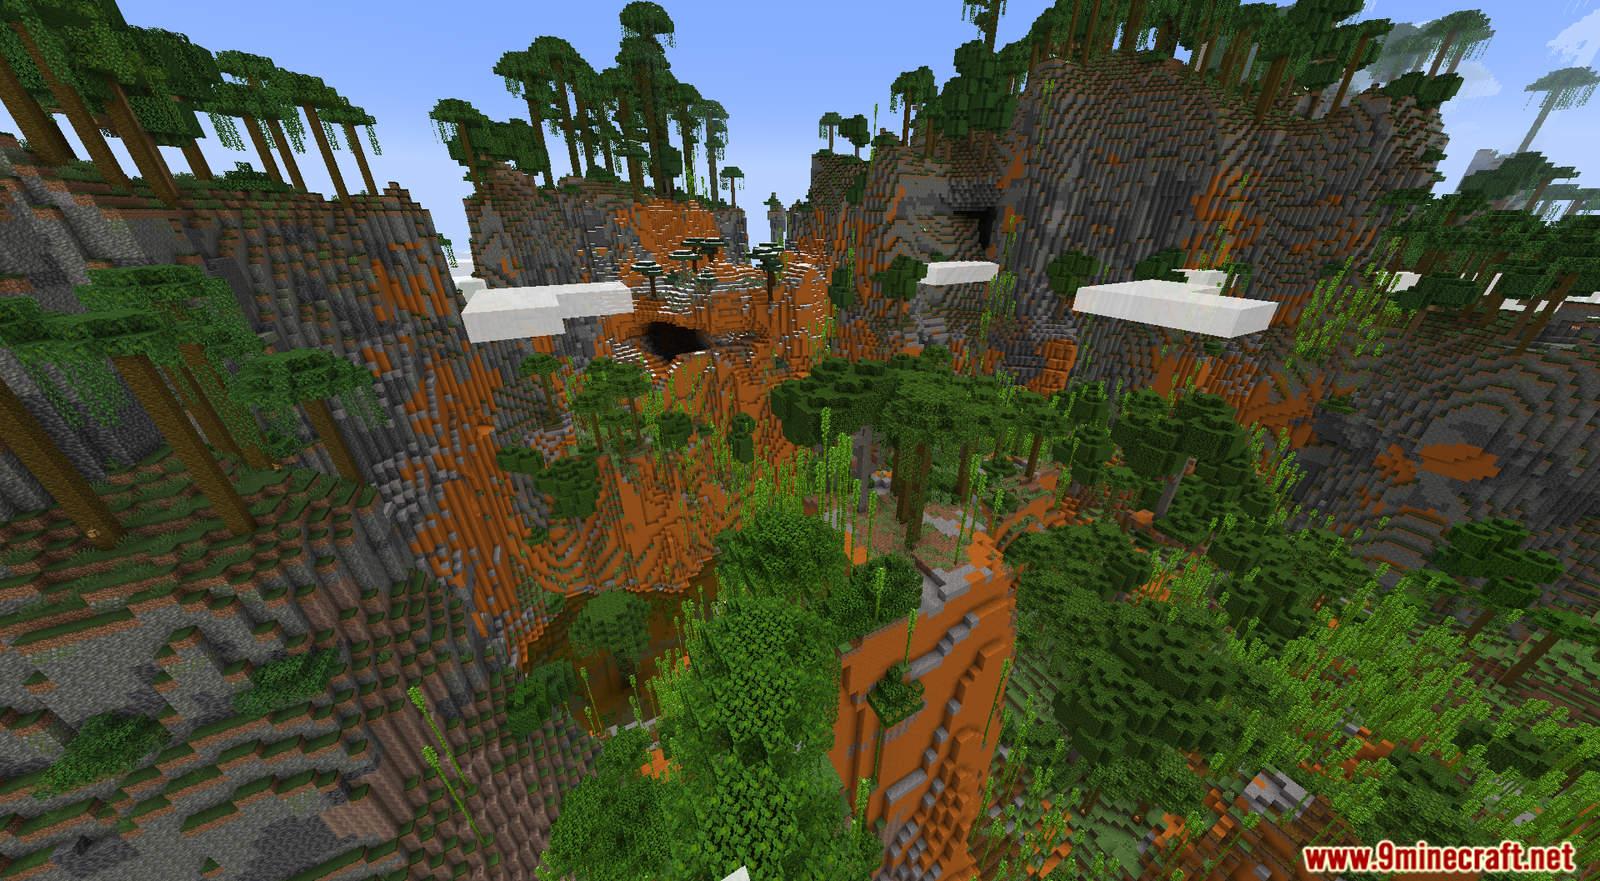 William Wythers' Overhauled Overworld Mod for Minecraft (20)